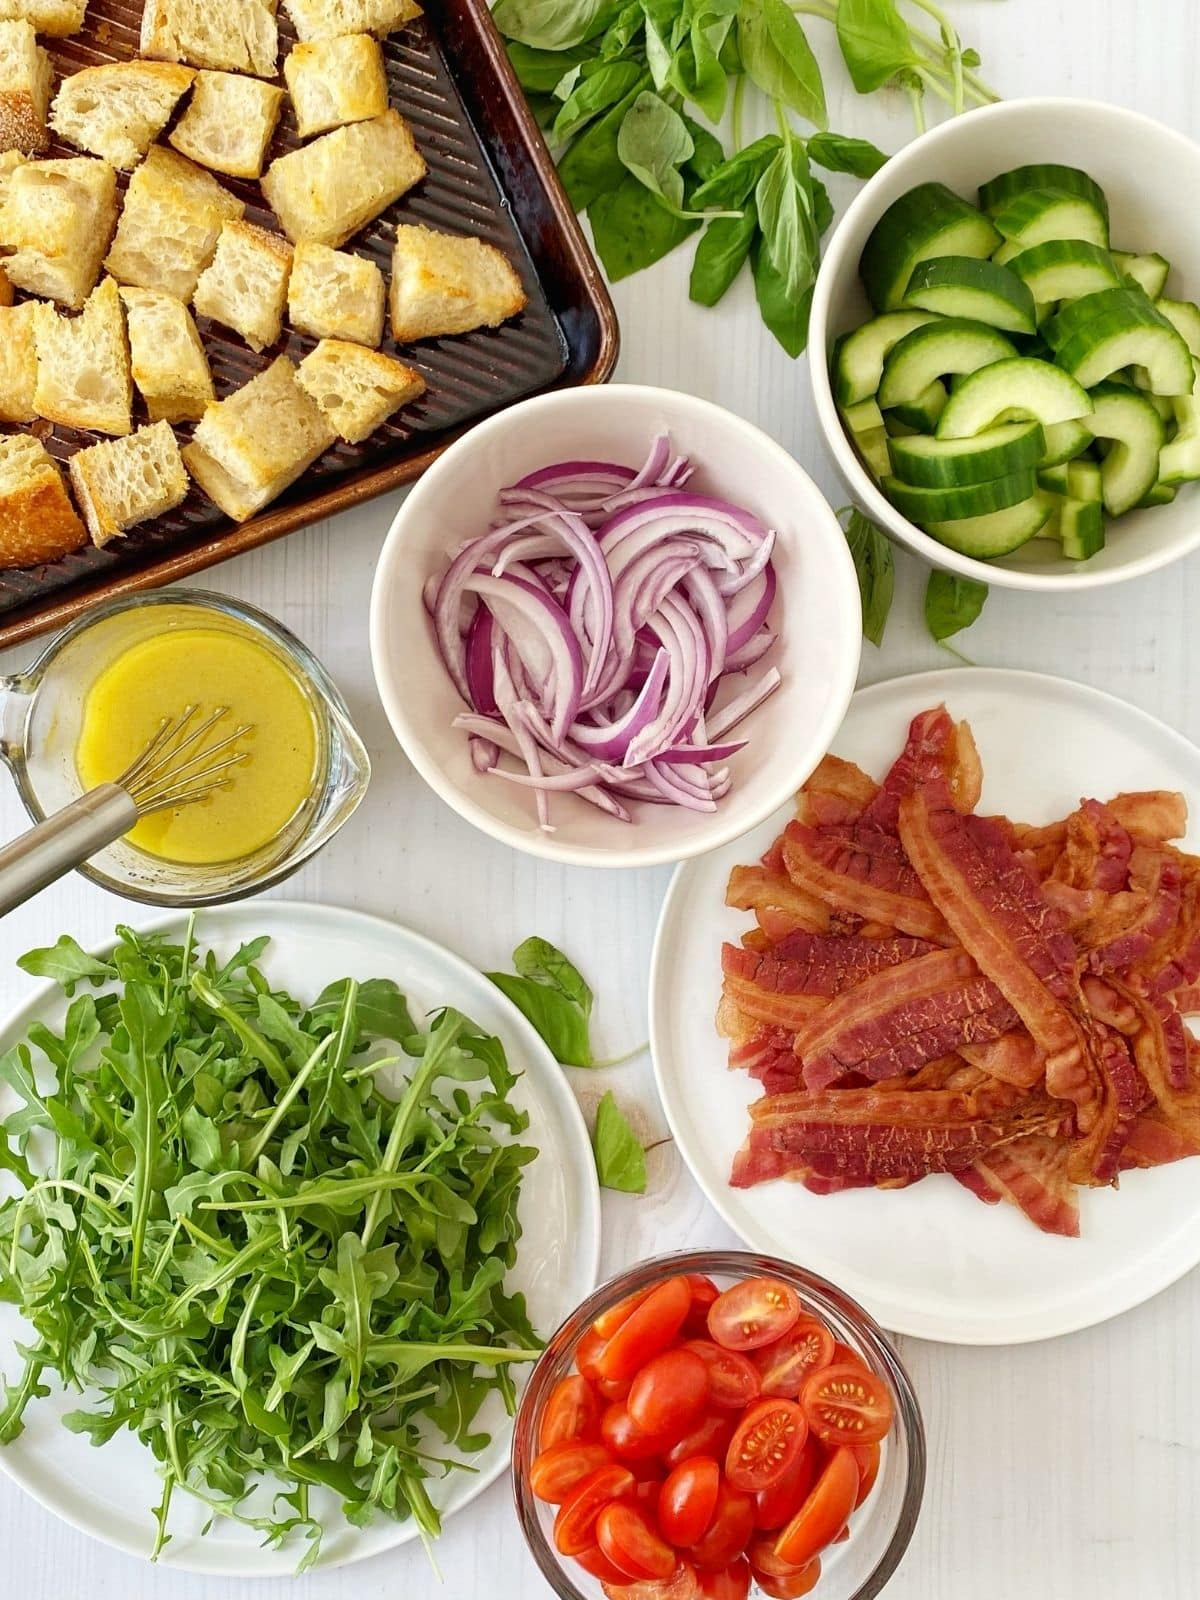 array of ingredients - bread, cucumbers, onions, bacon, tomatoes, arugula, vinaigrette